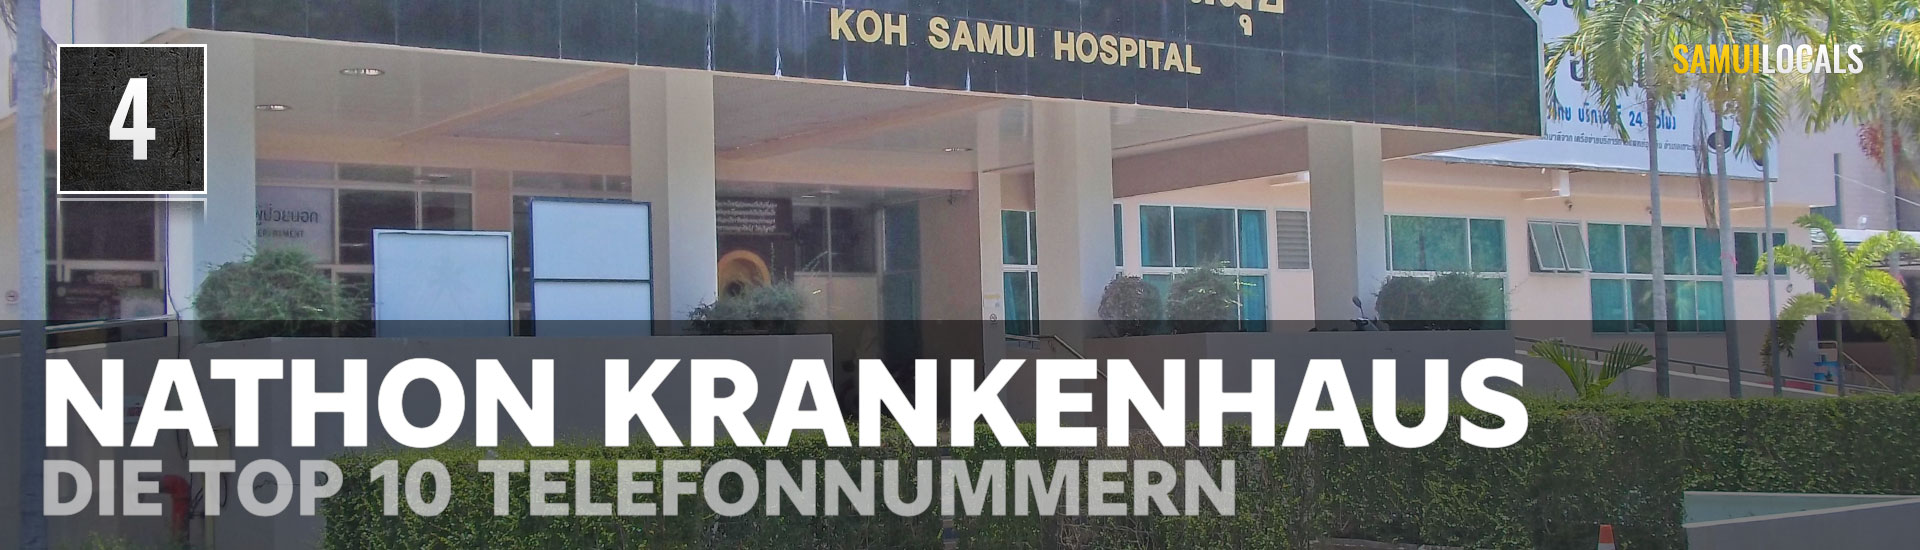 koh_samui_top_10_nathon_krankenhaus